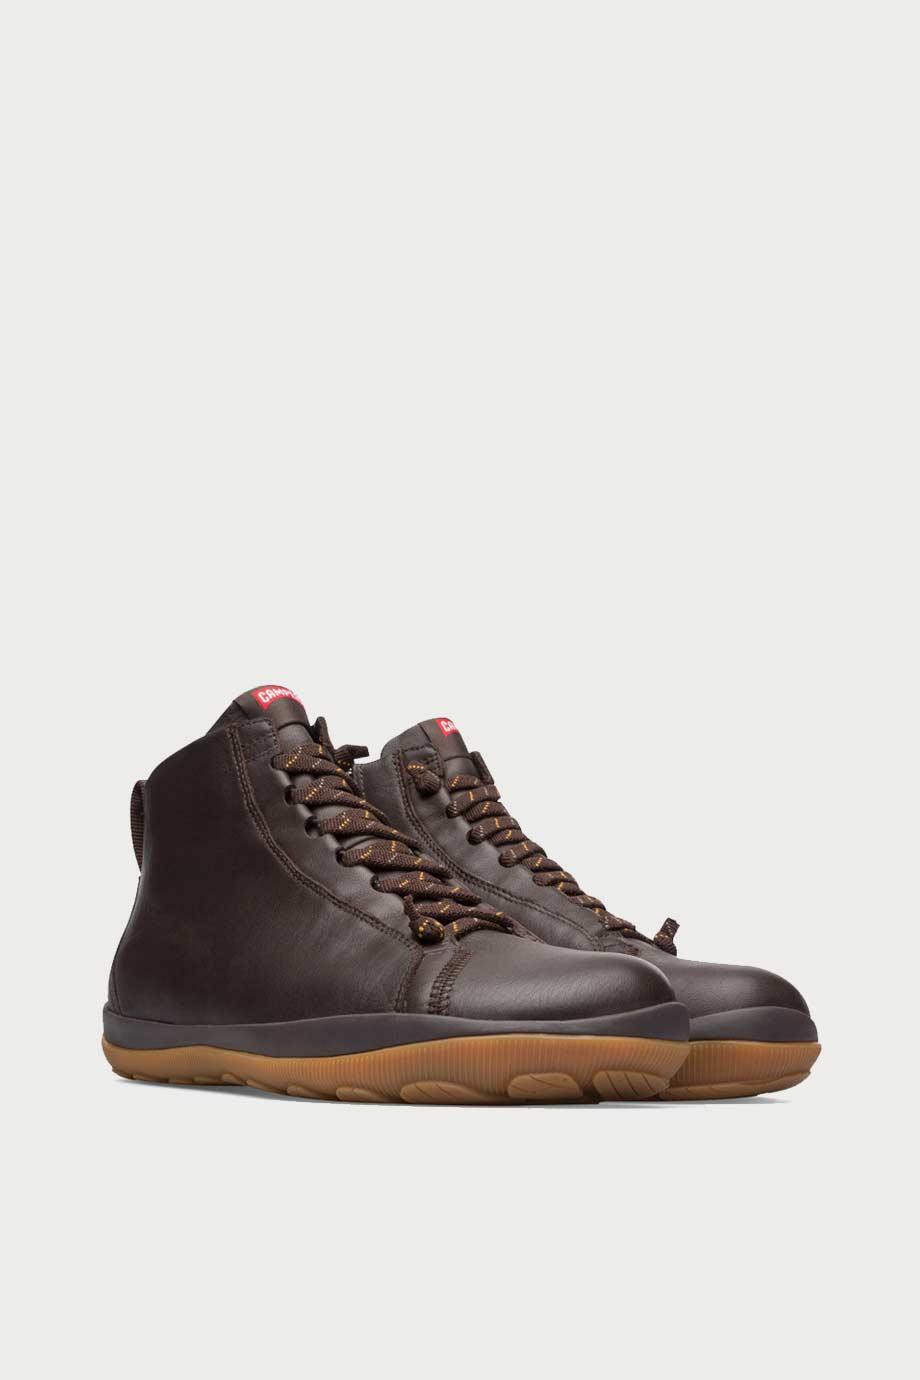 spiridoula metheniti shoes xalkida p k300287 008 peu pista brown camper 3